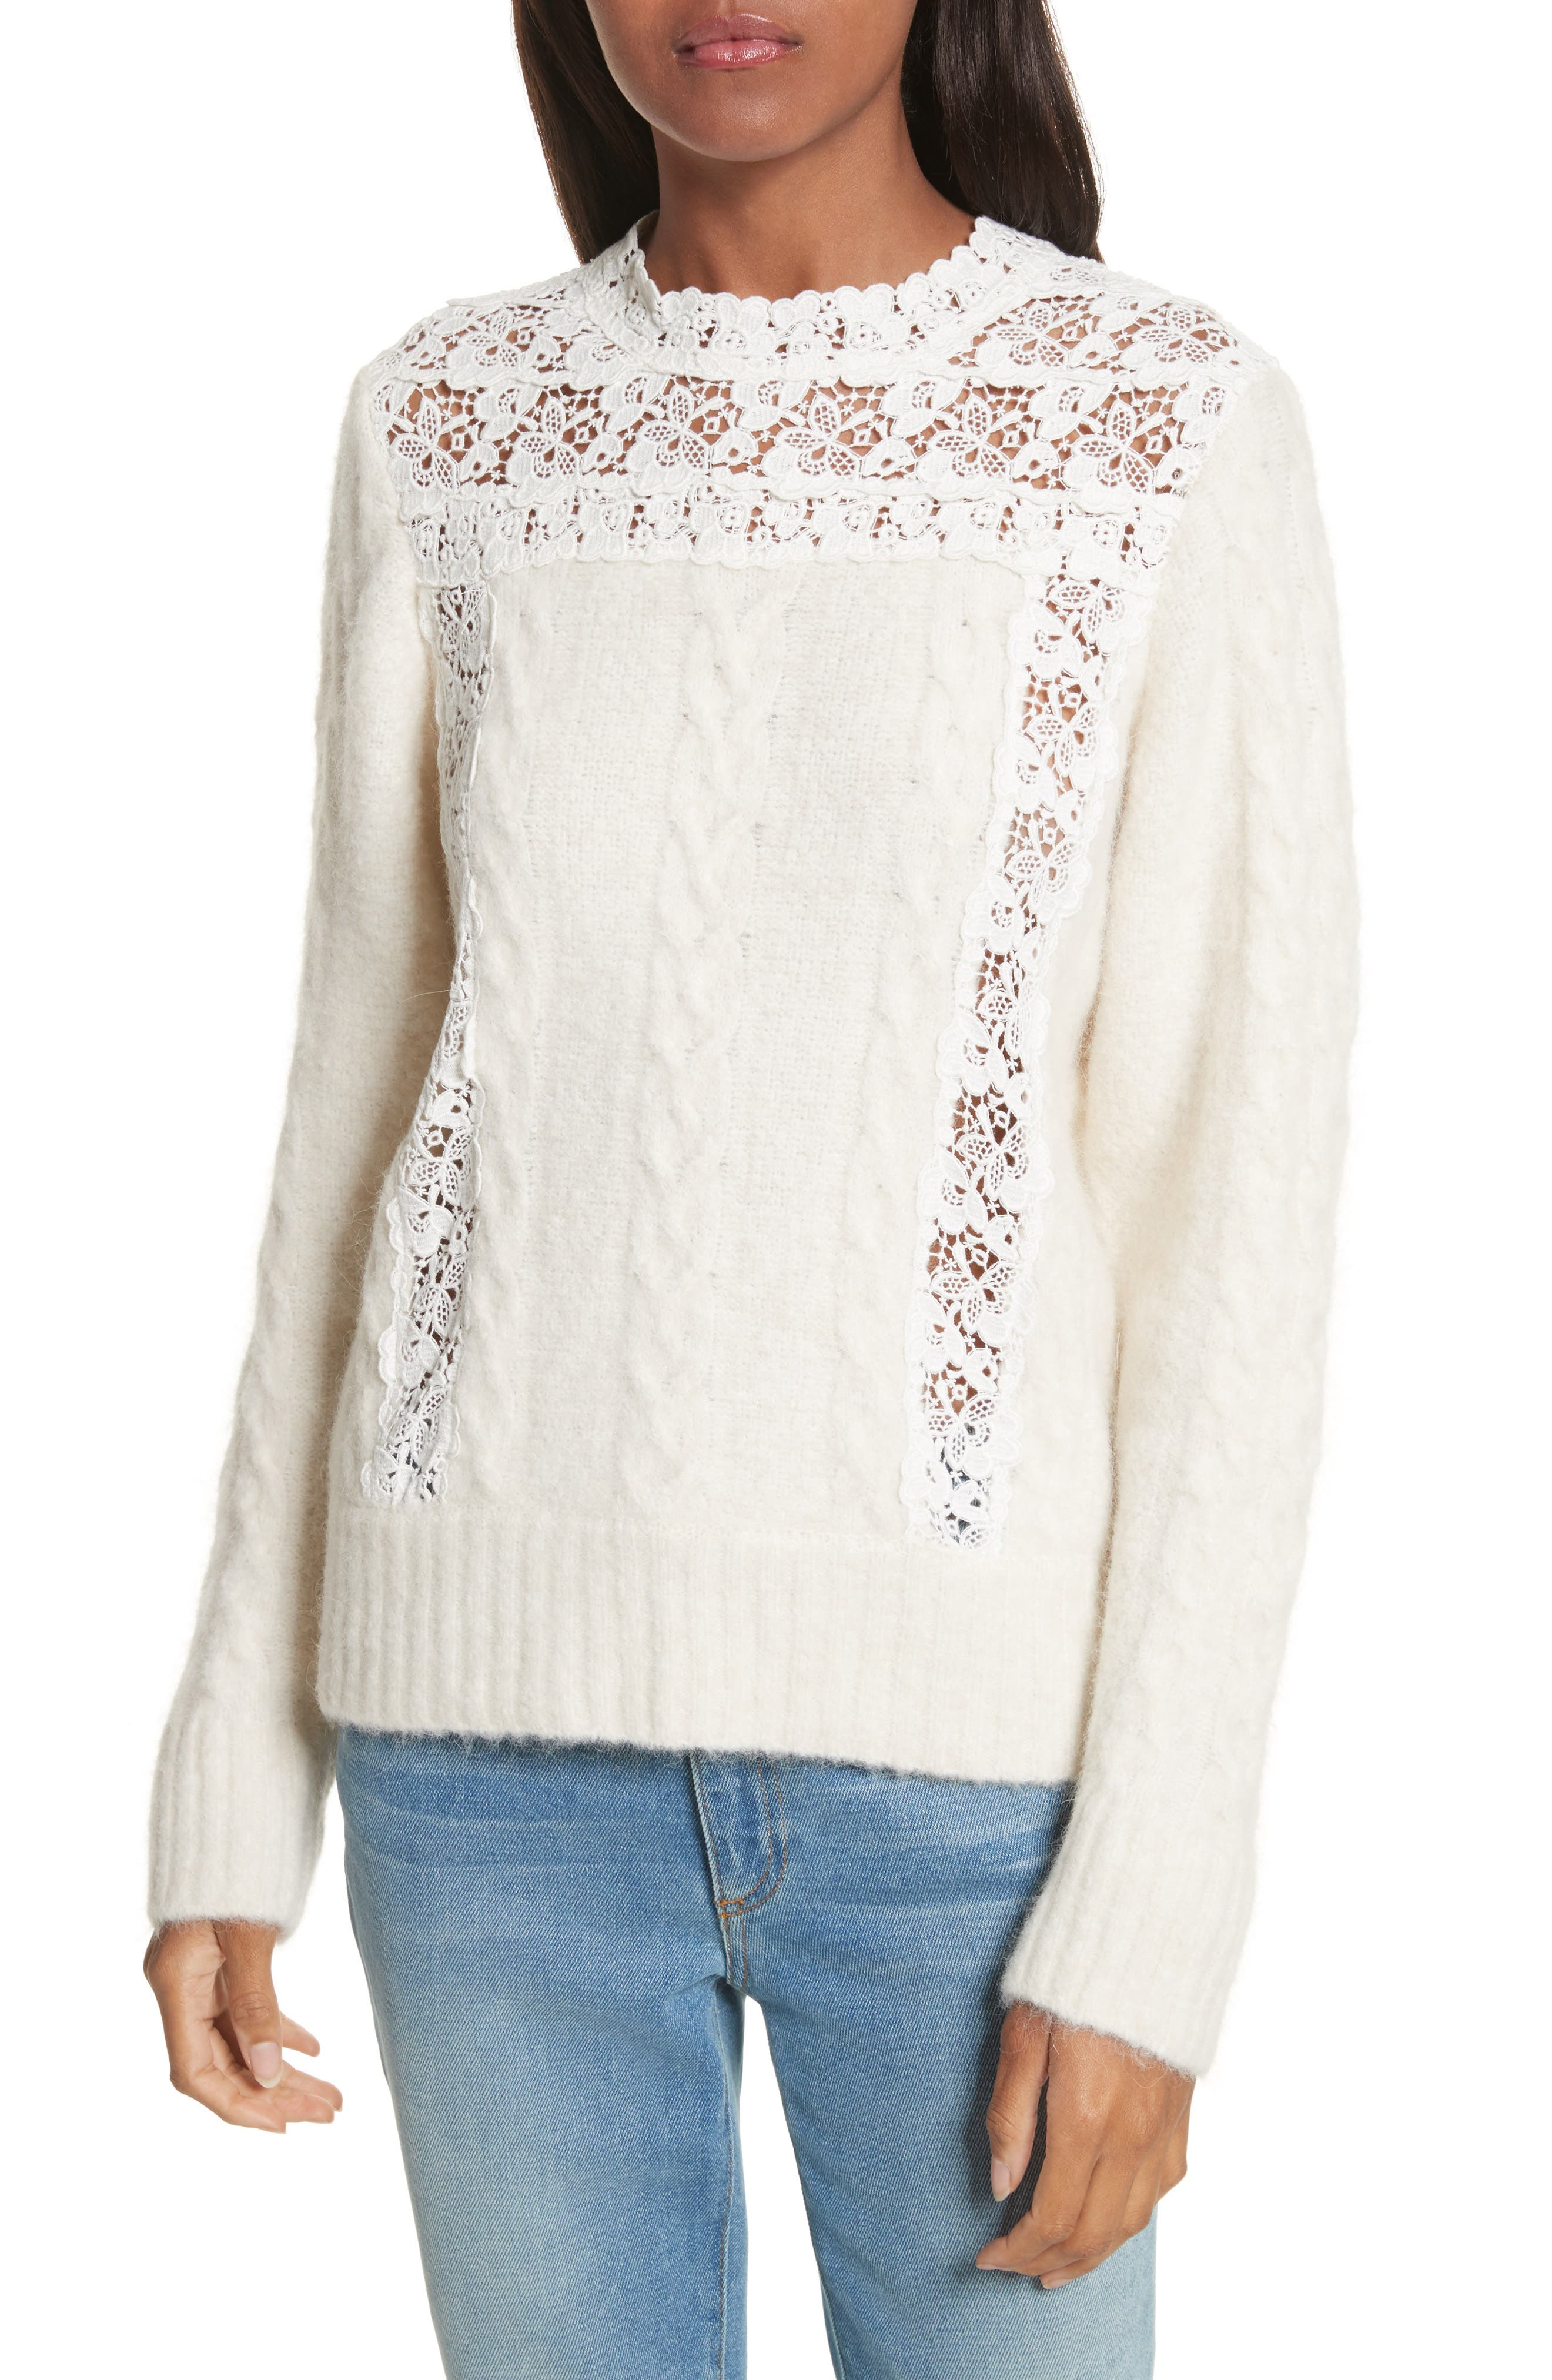 Main Image - Sea Lace Lace Inset Sweater